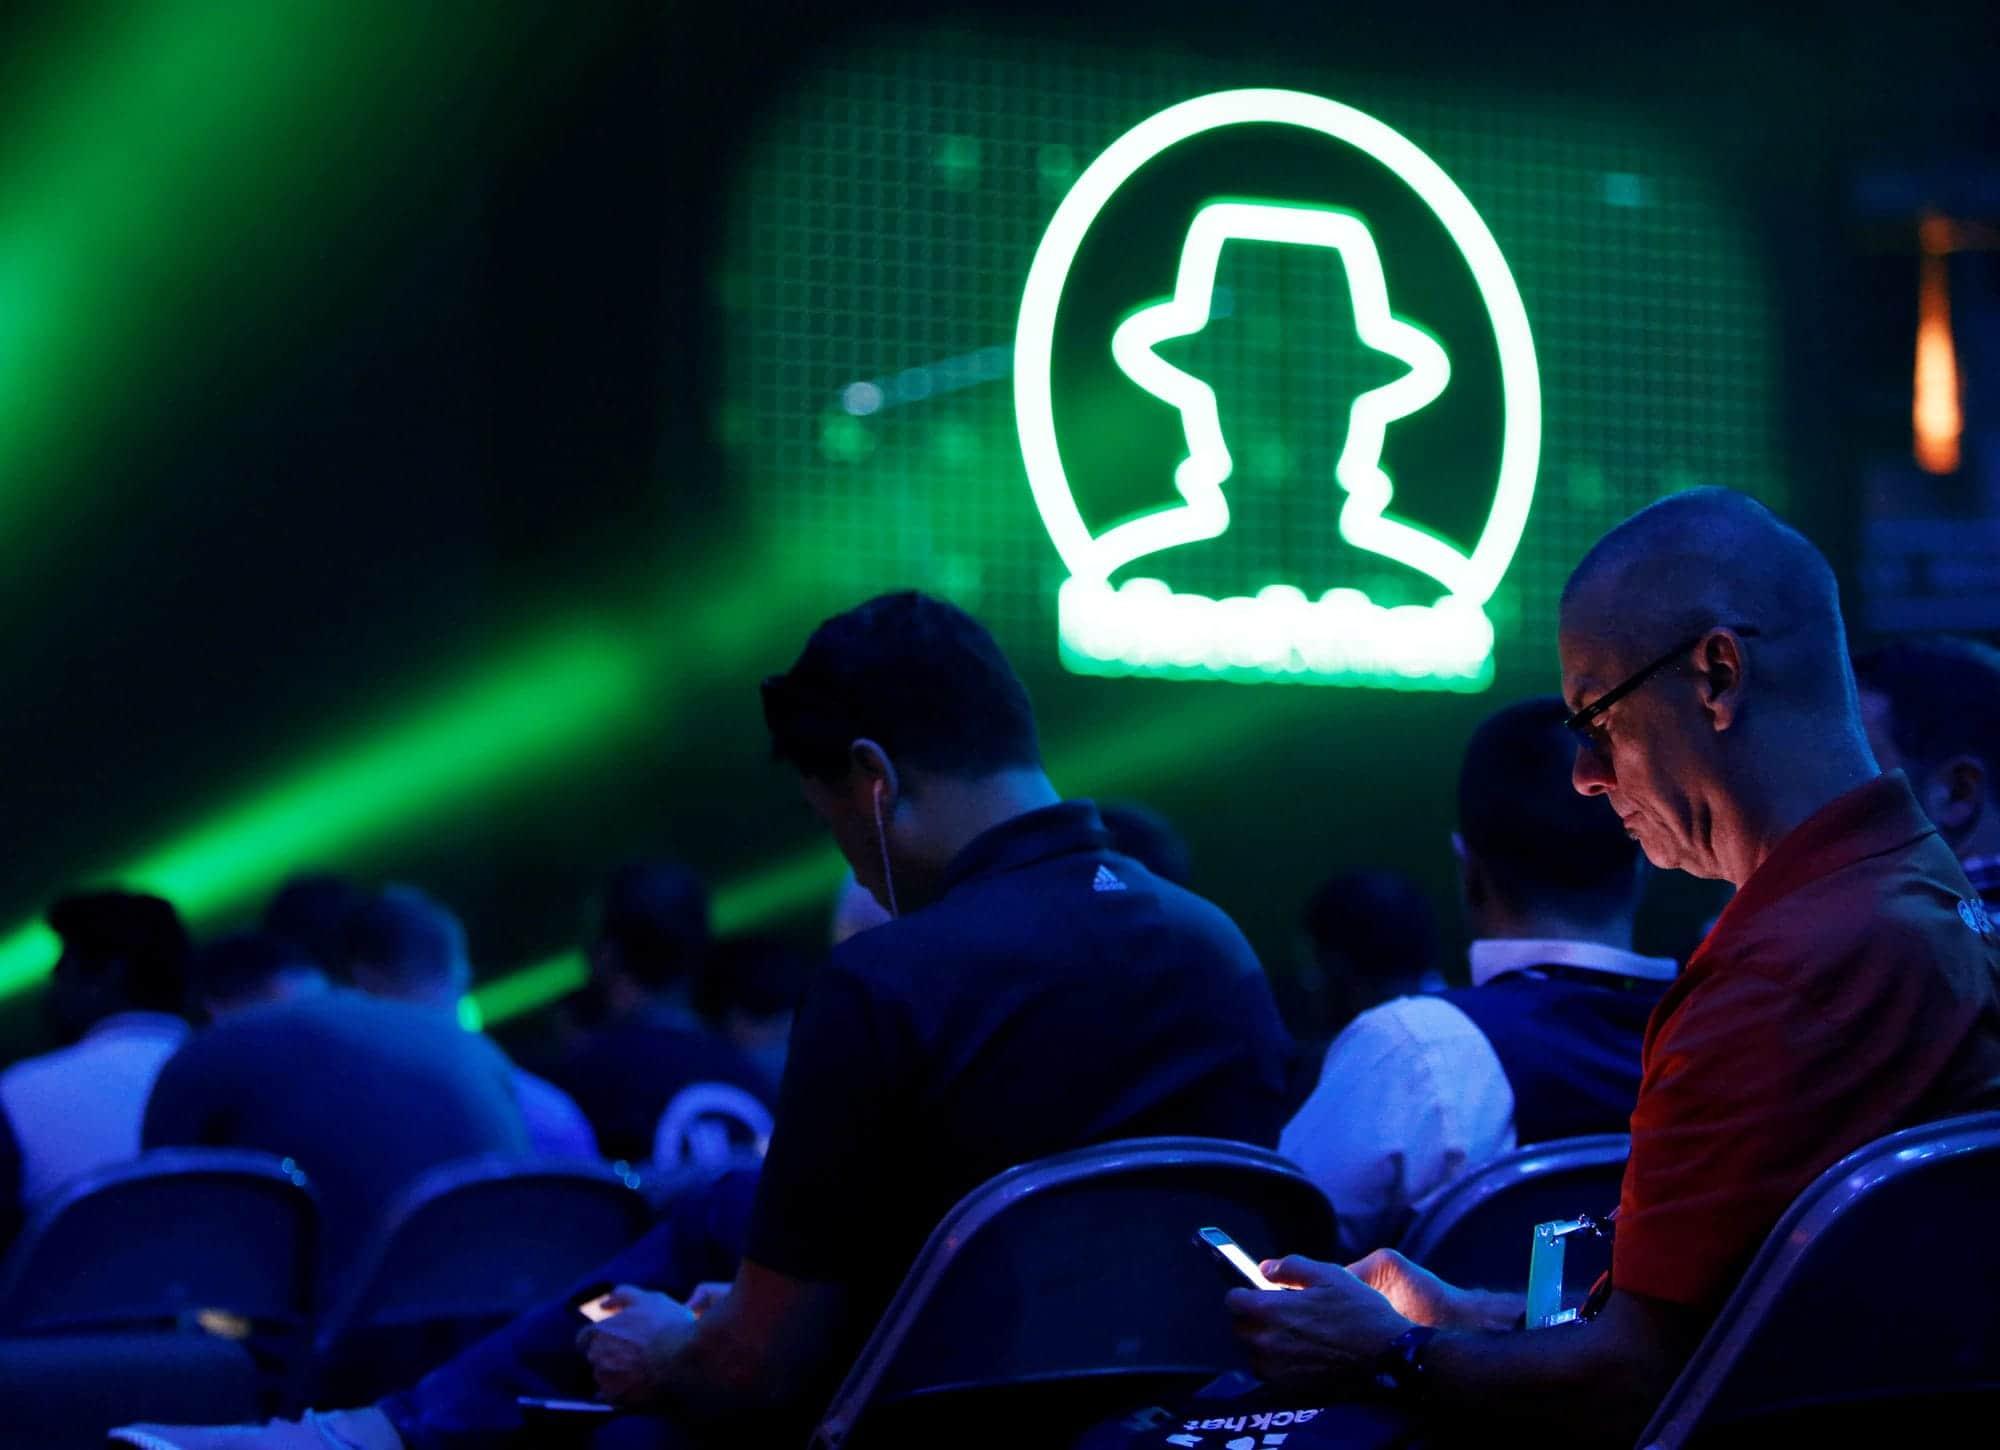 چگونه یک هکر کلاه سبز شویم؟